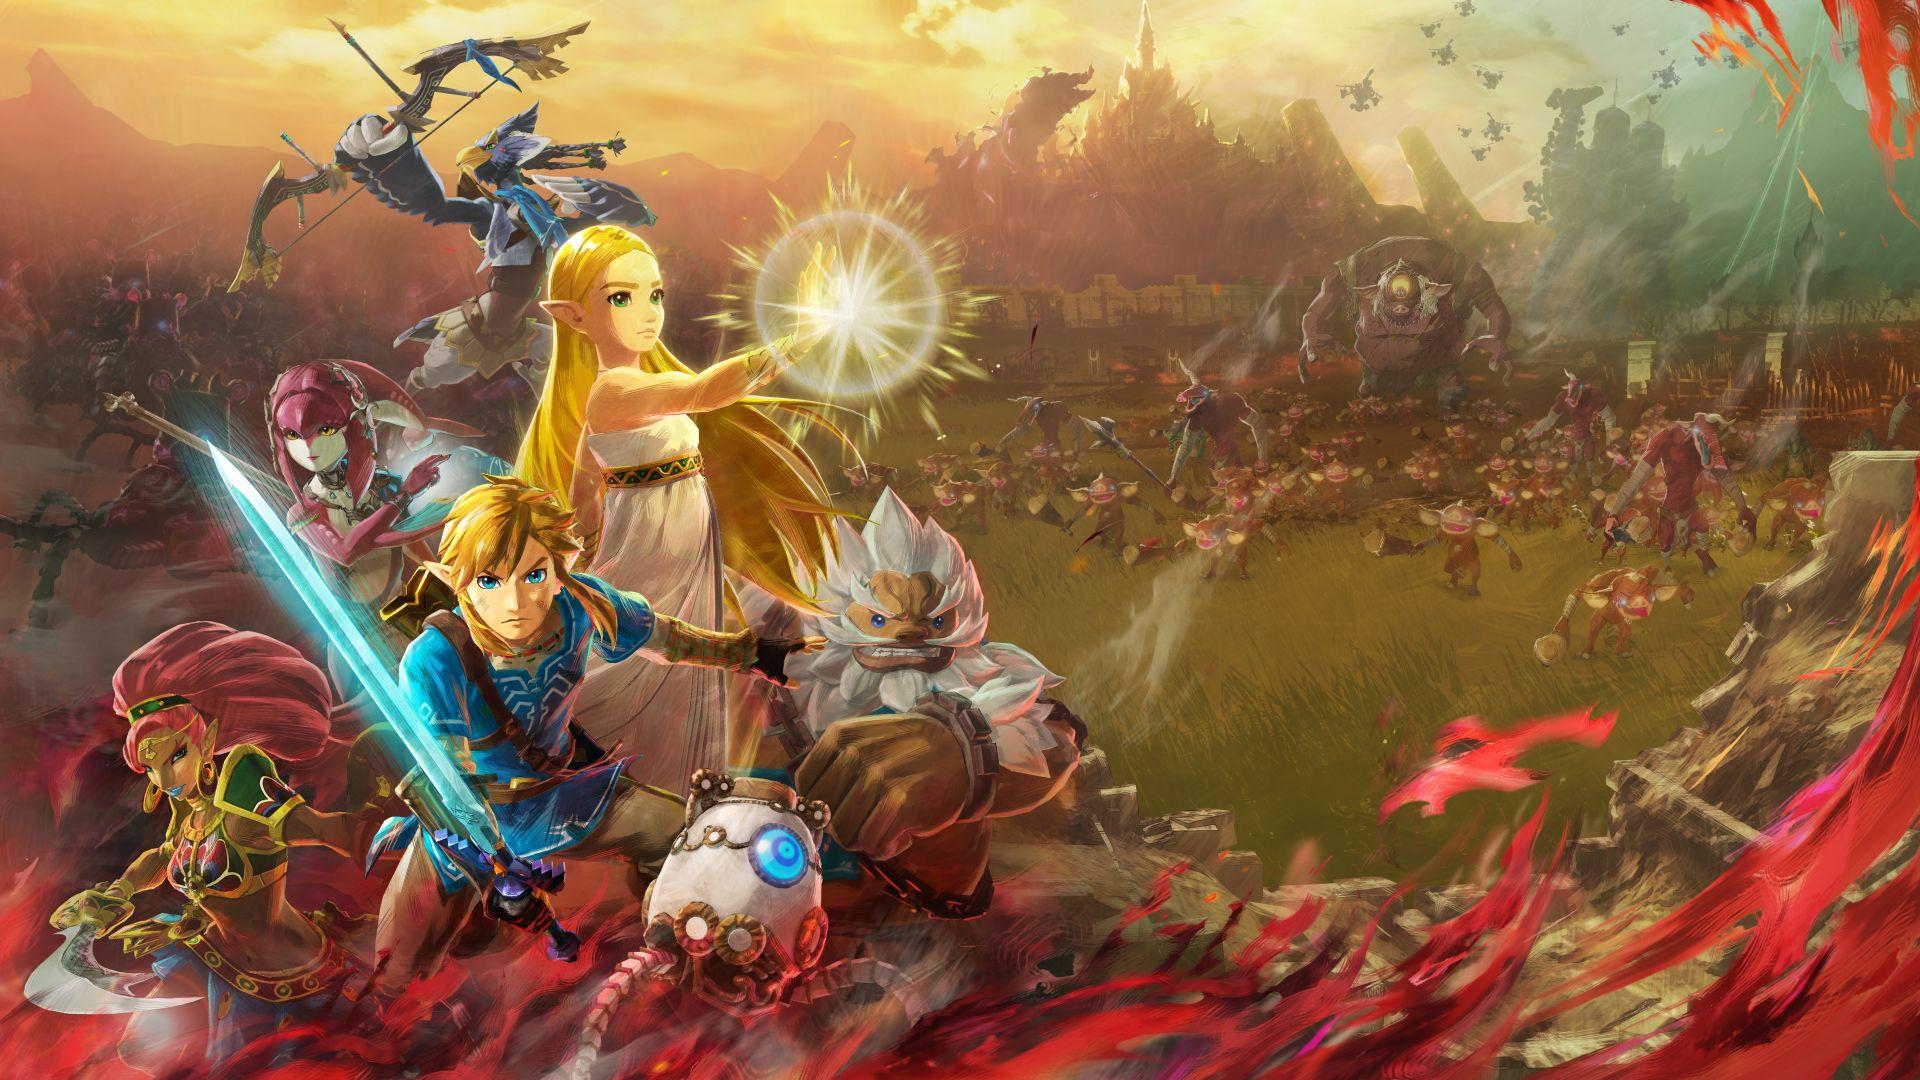 Nintendo представила релизный трейлер Hyrule Warriors: Age of Calamity